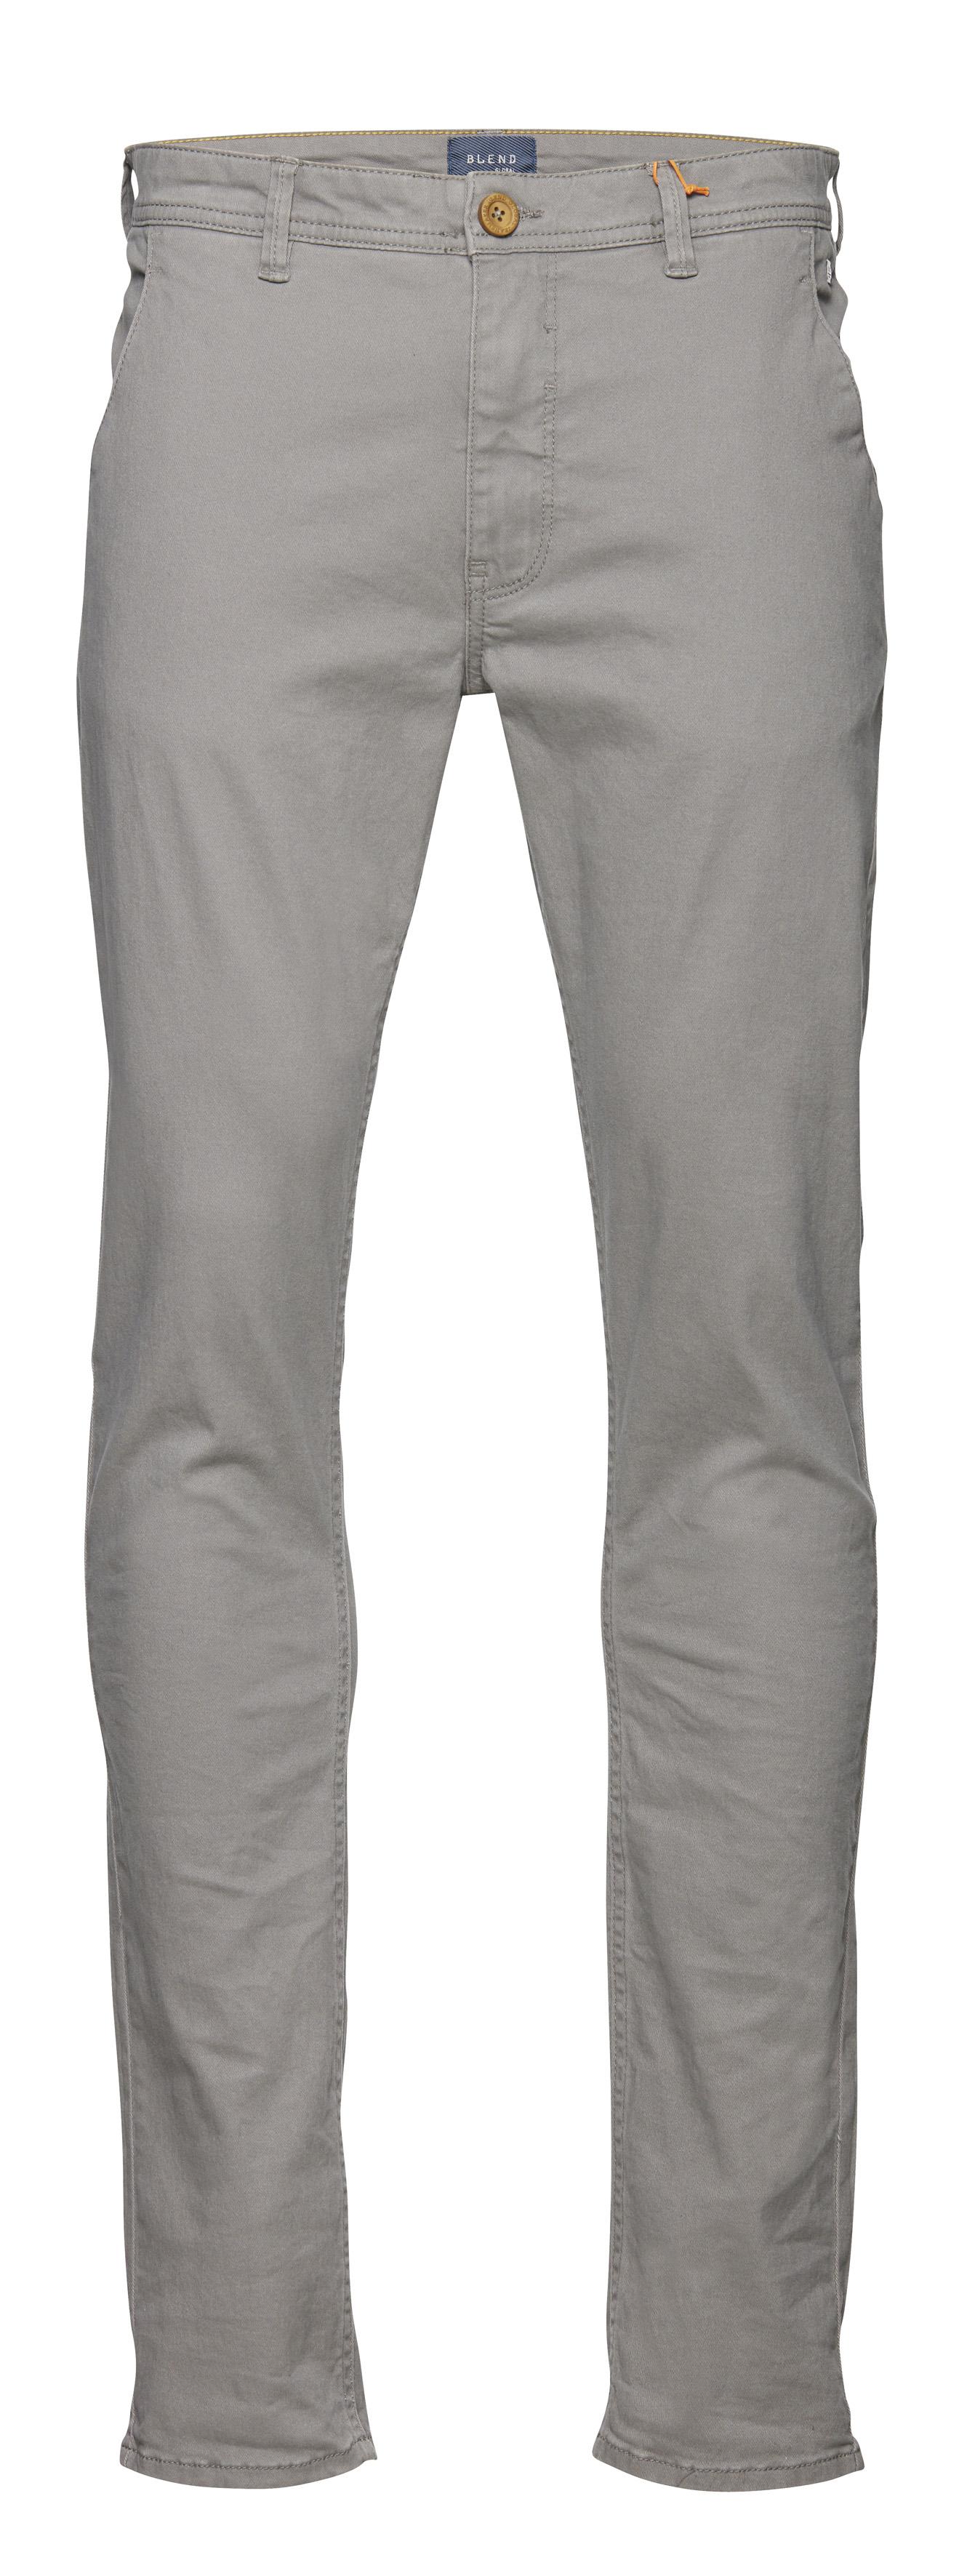 Granite Pants Casual fra Blend He – Køb Granite Pants Casual fra str. 28-38 her